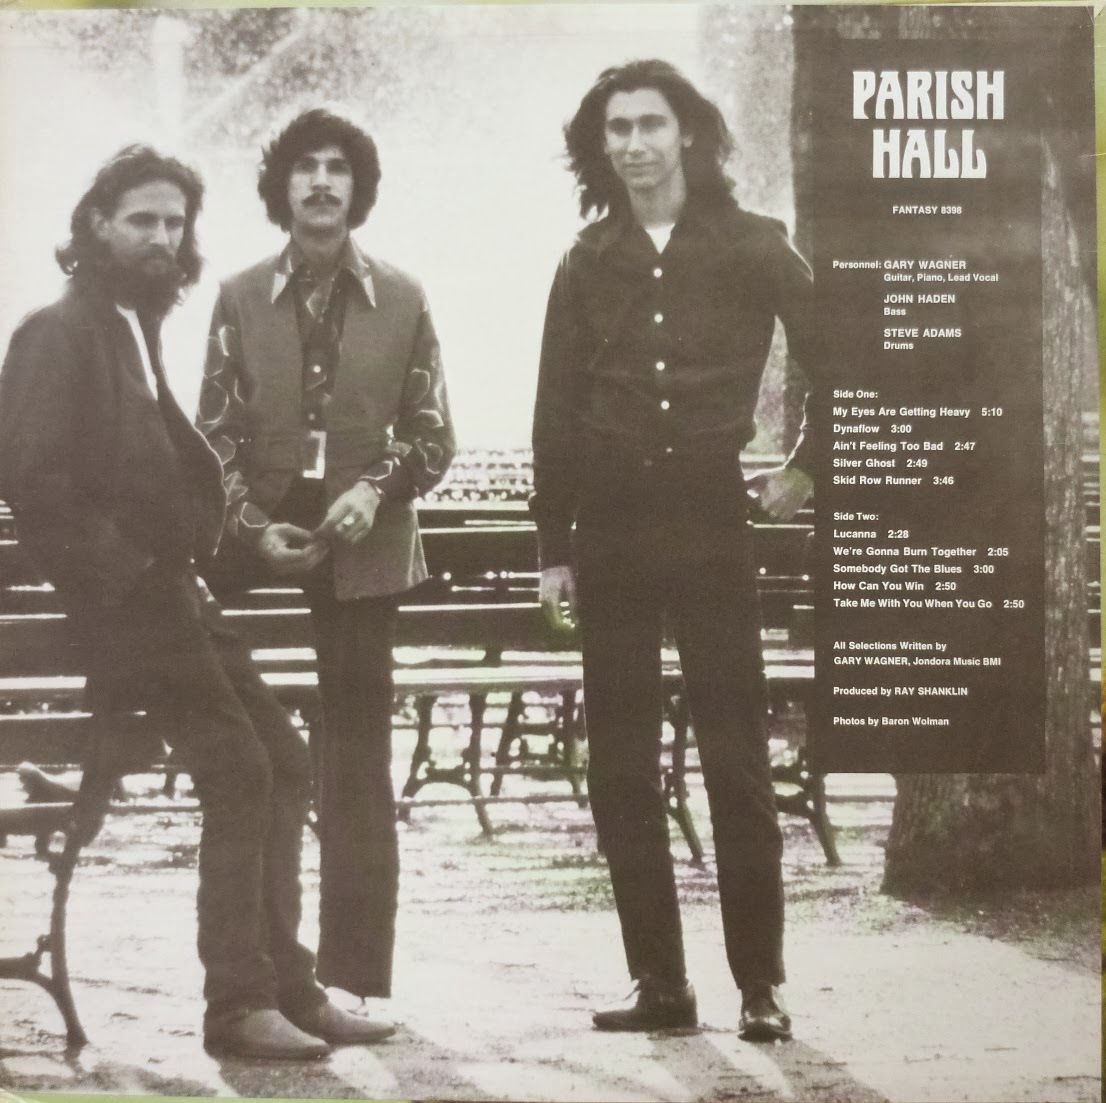 parish_hall_1970_psychedelic_rocknroll_hard_rock_jimi_hendrix_fantasy_back